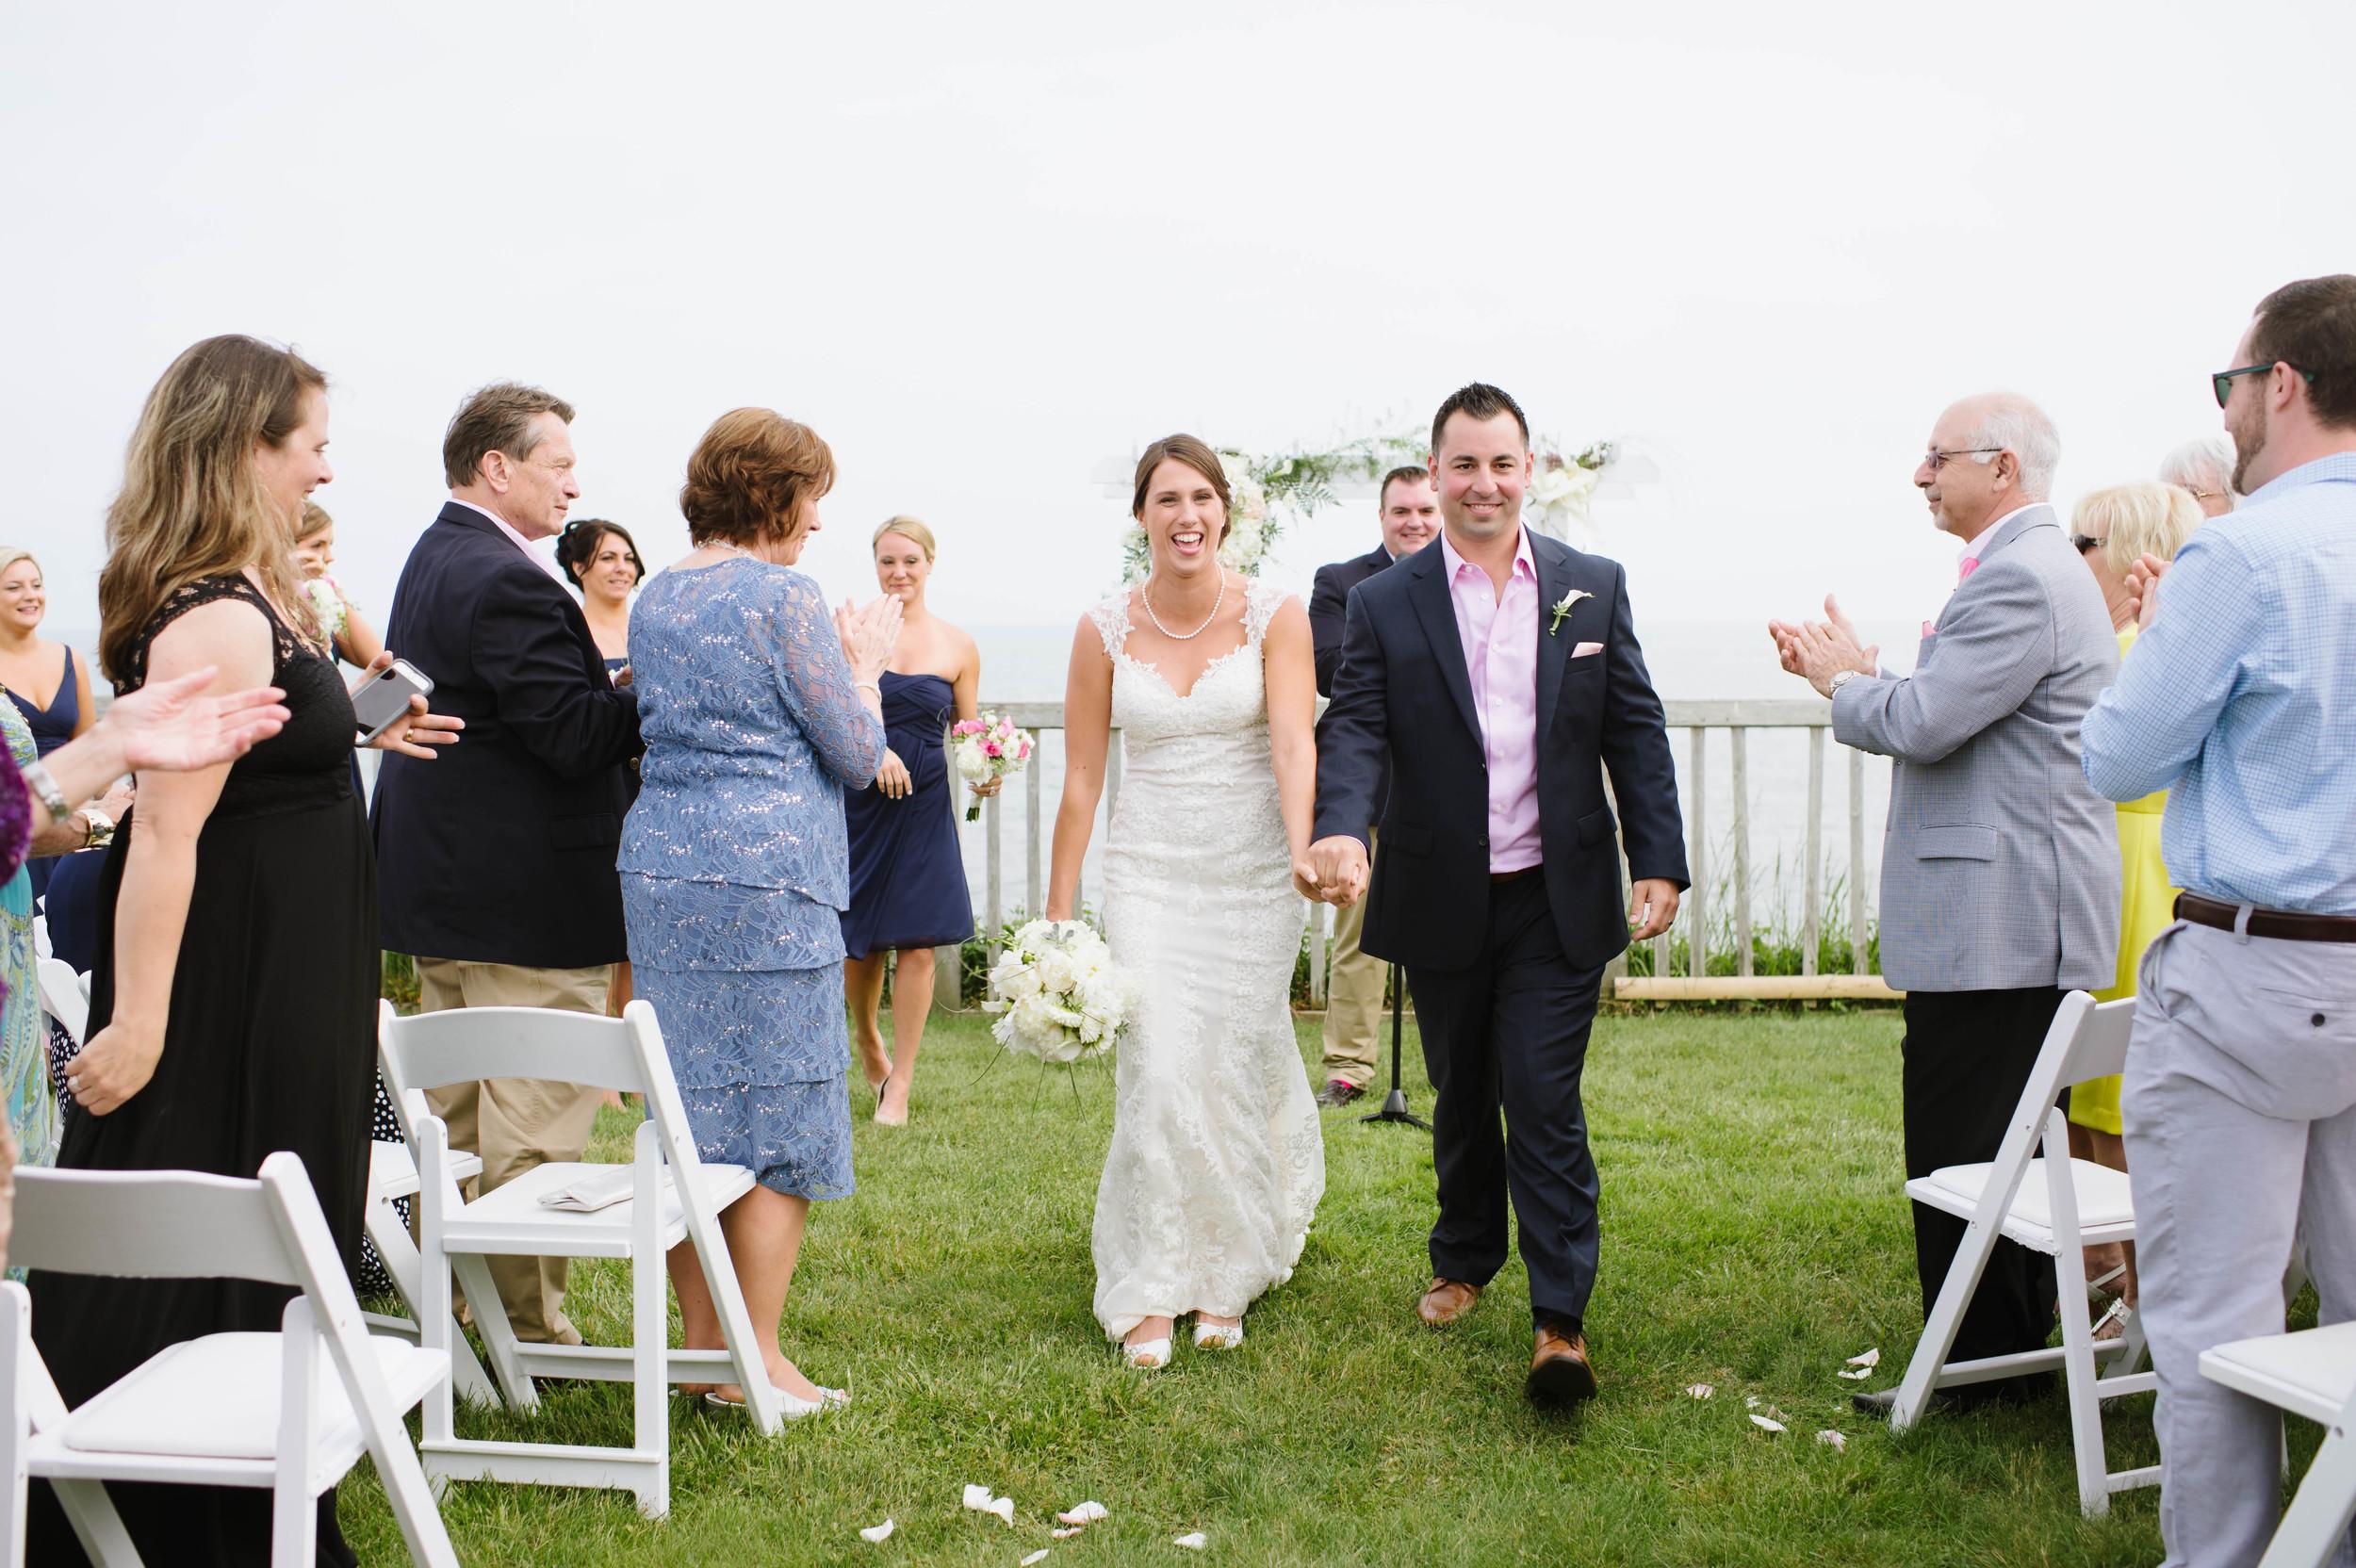 Pelham_House_Wedding_Cape_Cod016.jpg